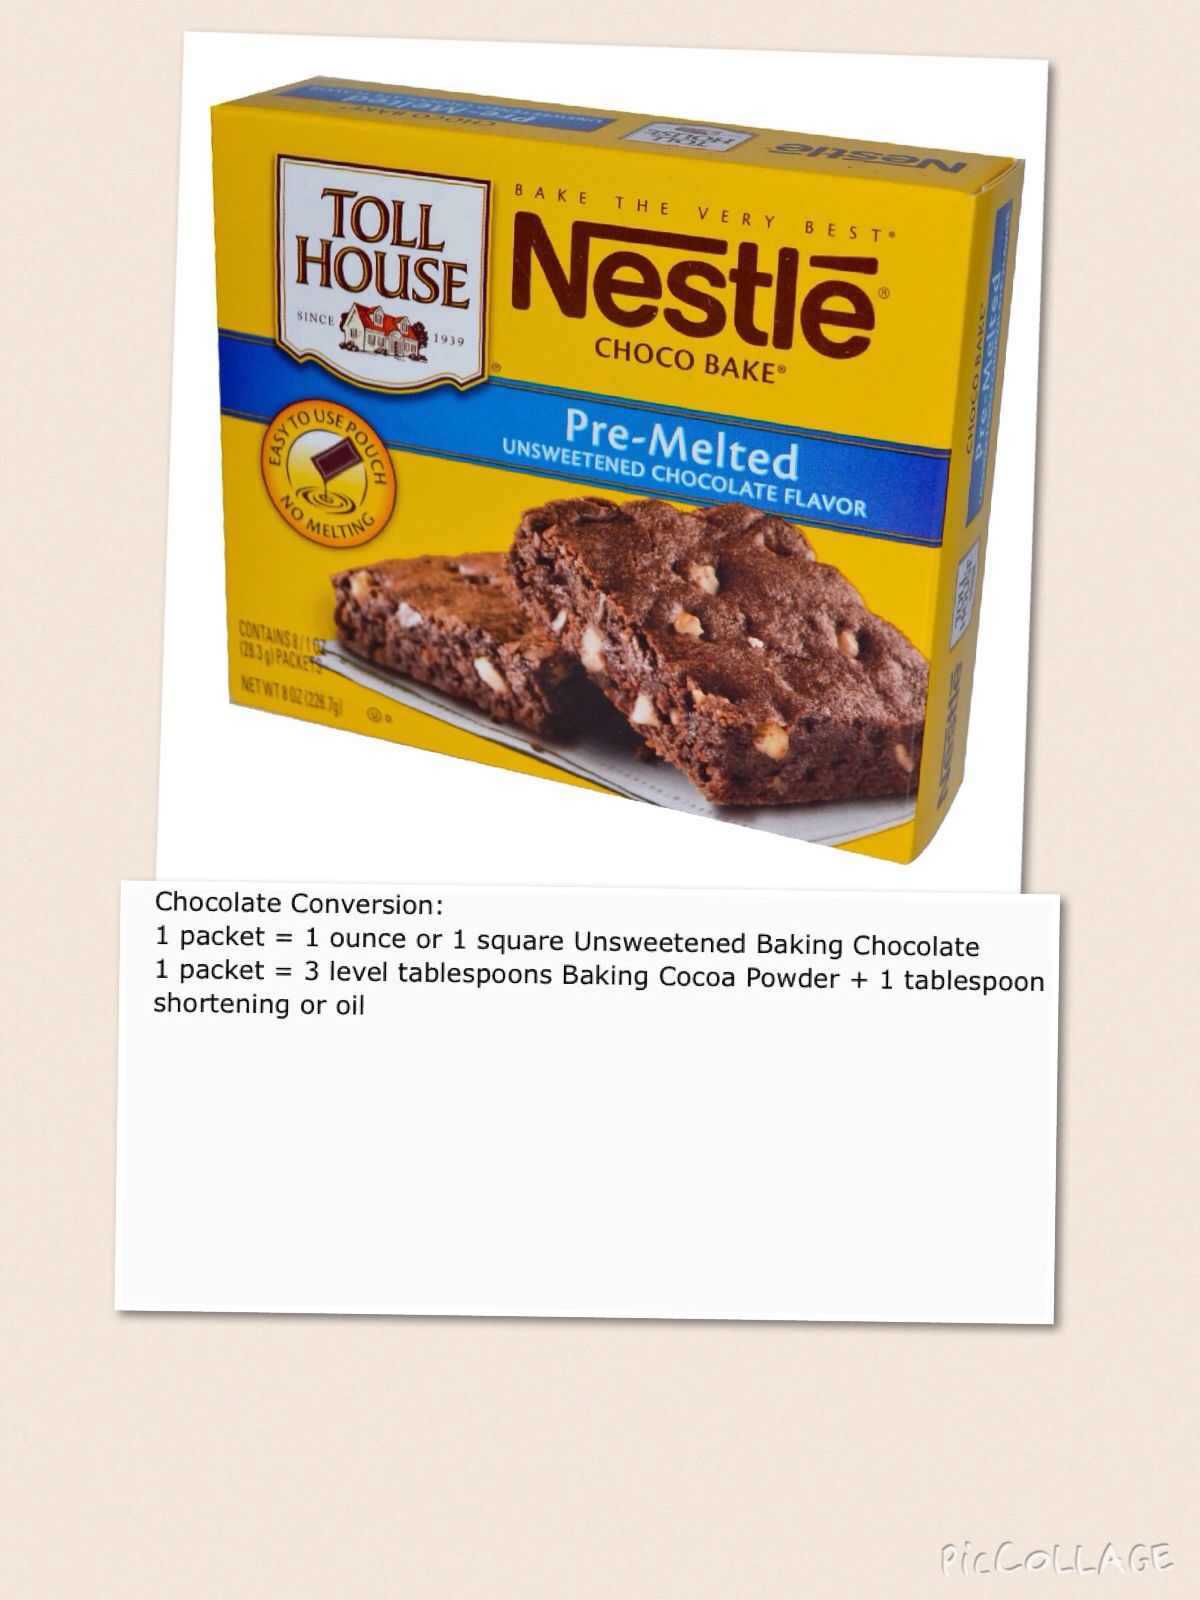 Choco bake substitute baking cocoa melting chocolate